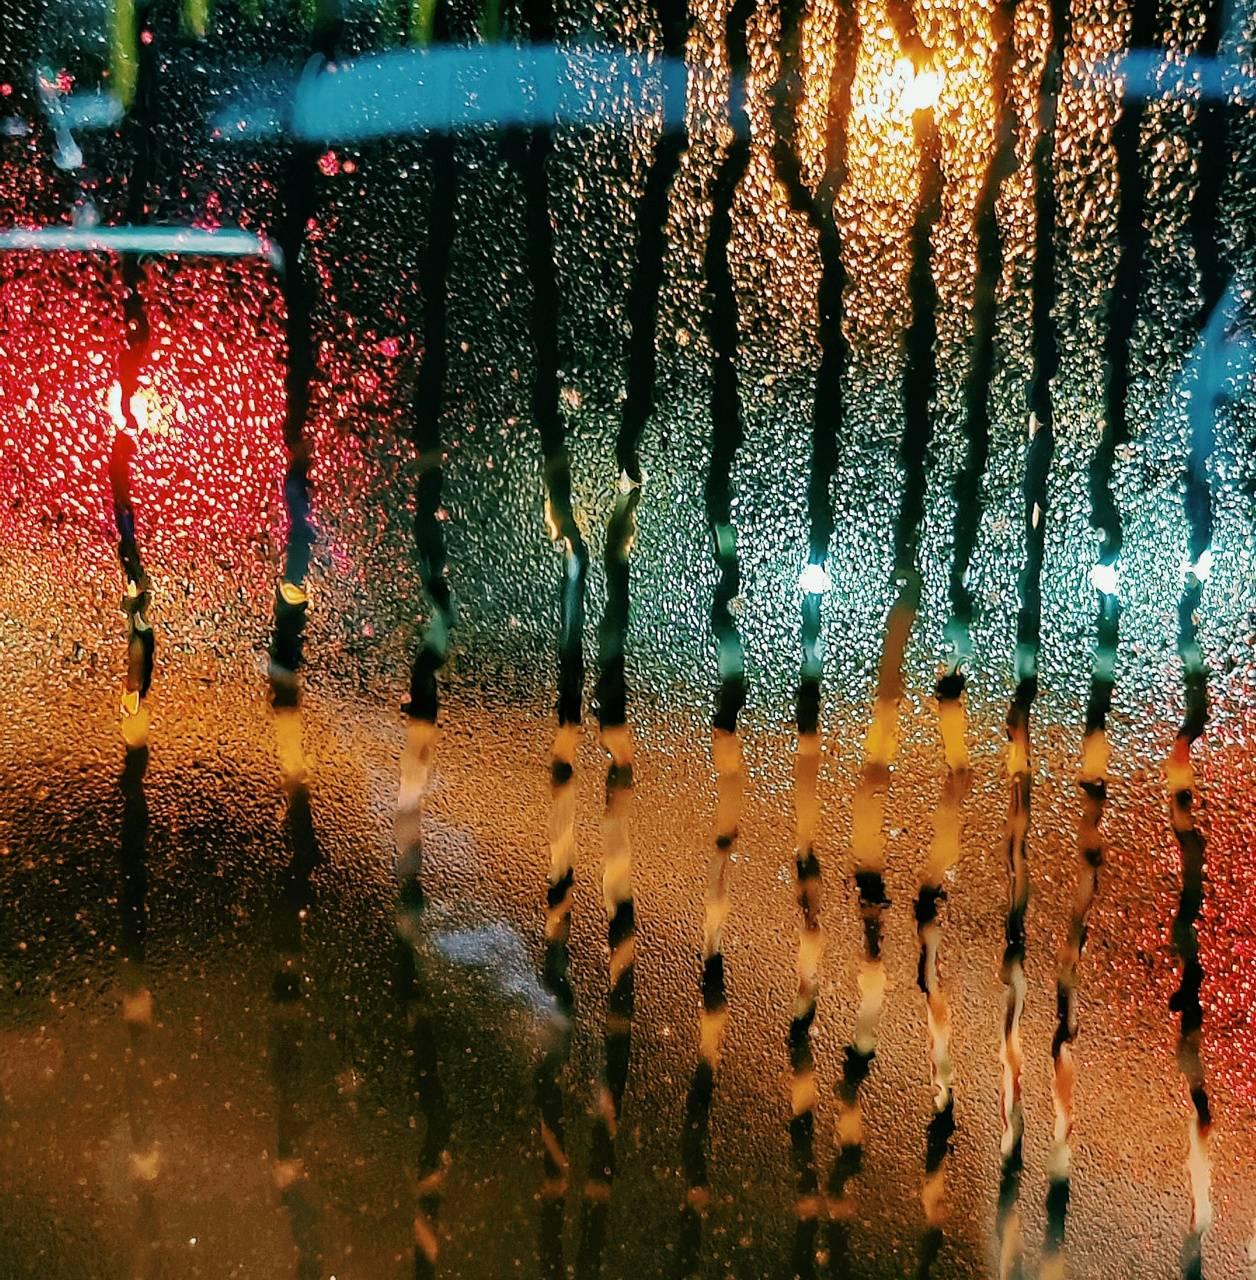 Rainy vibea